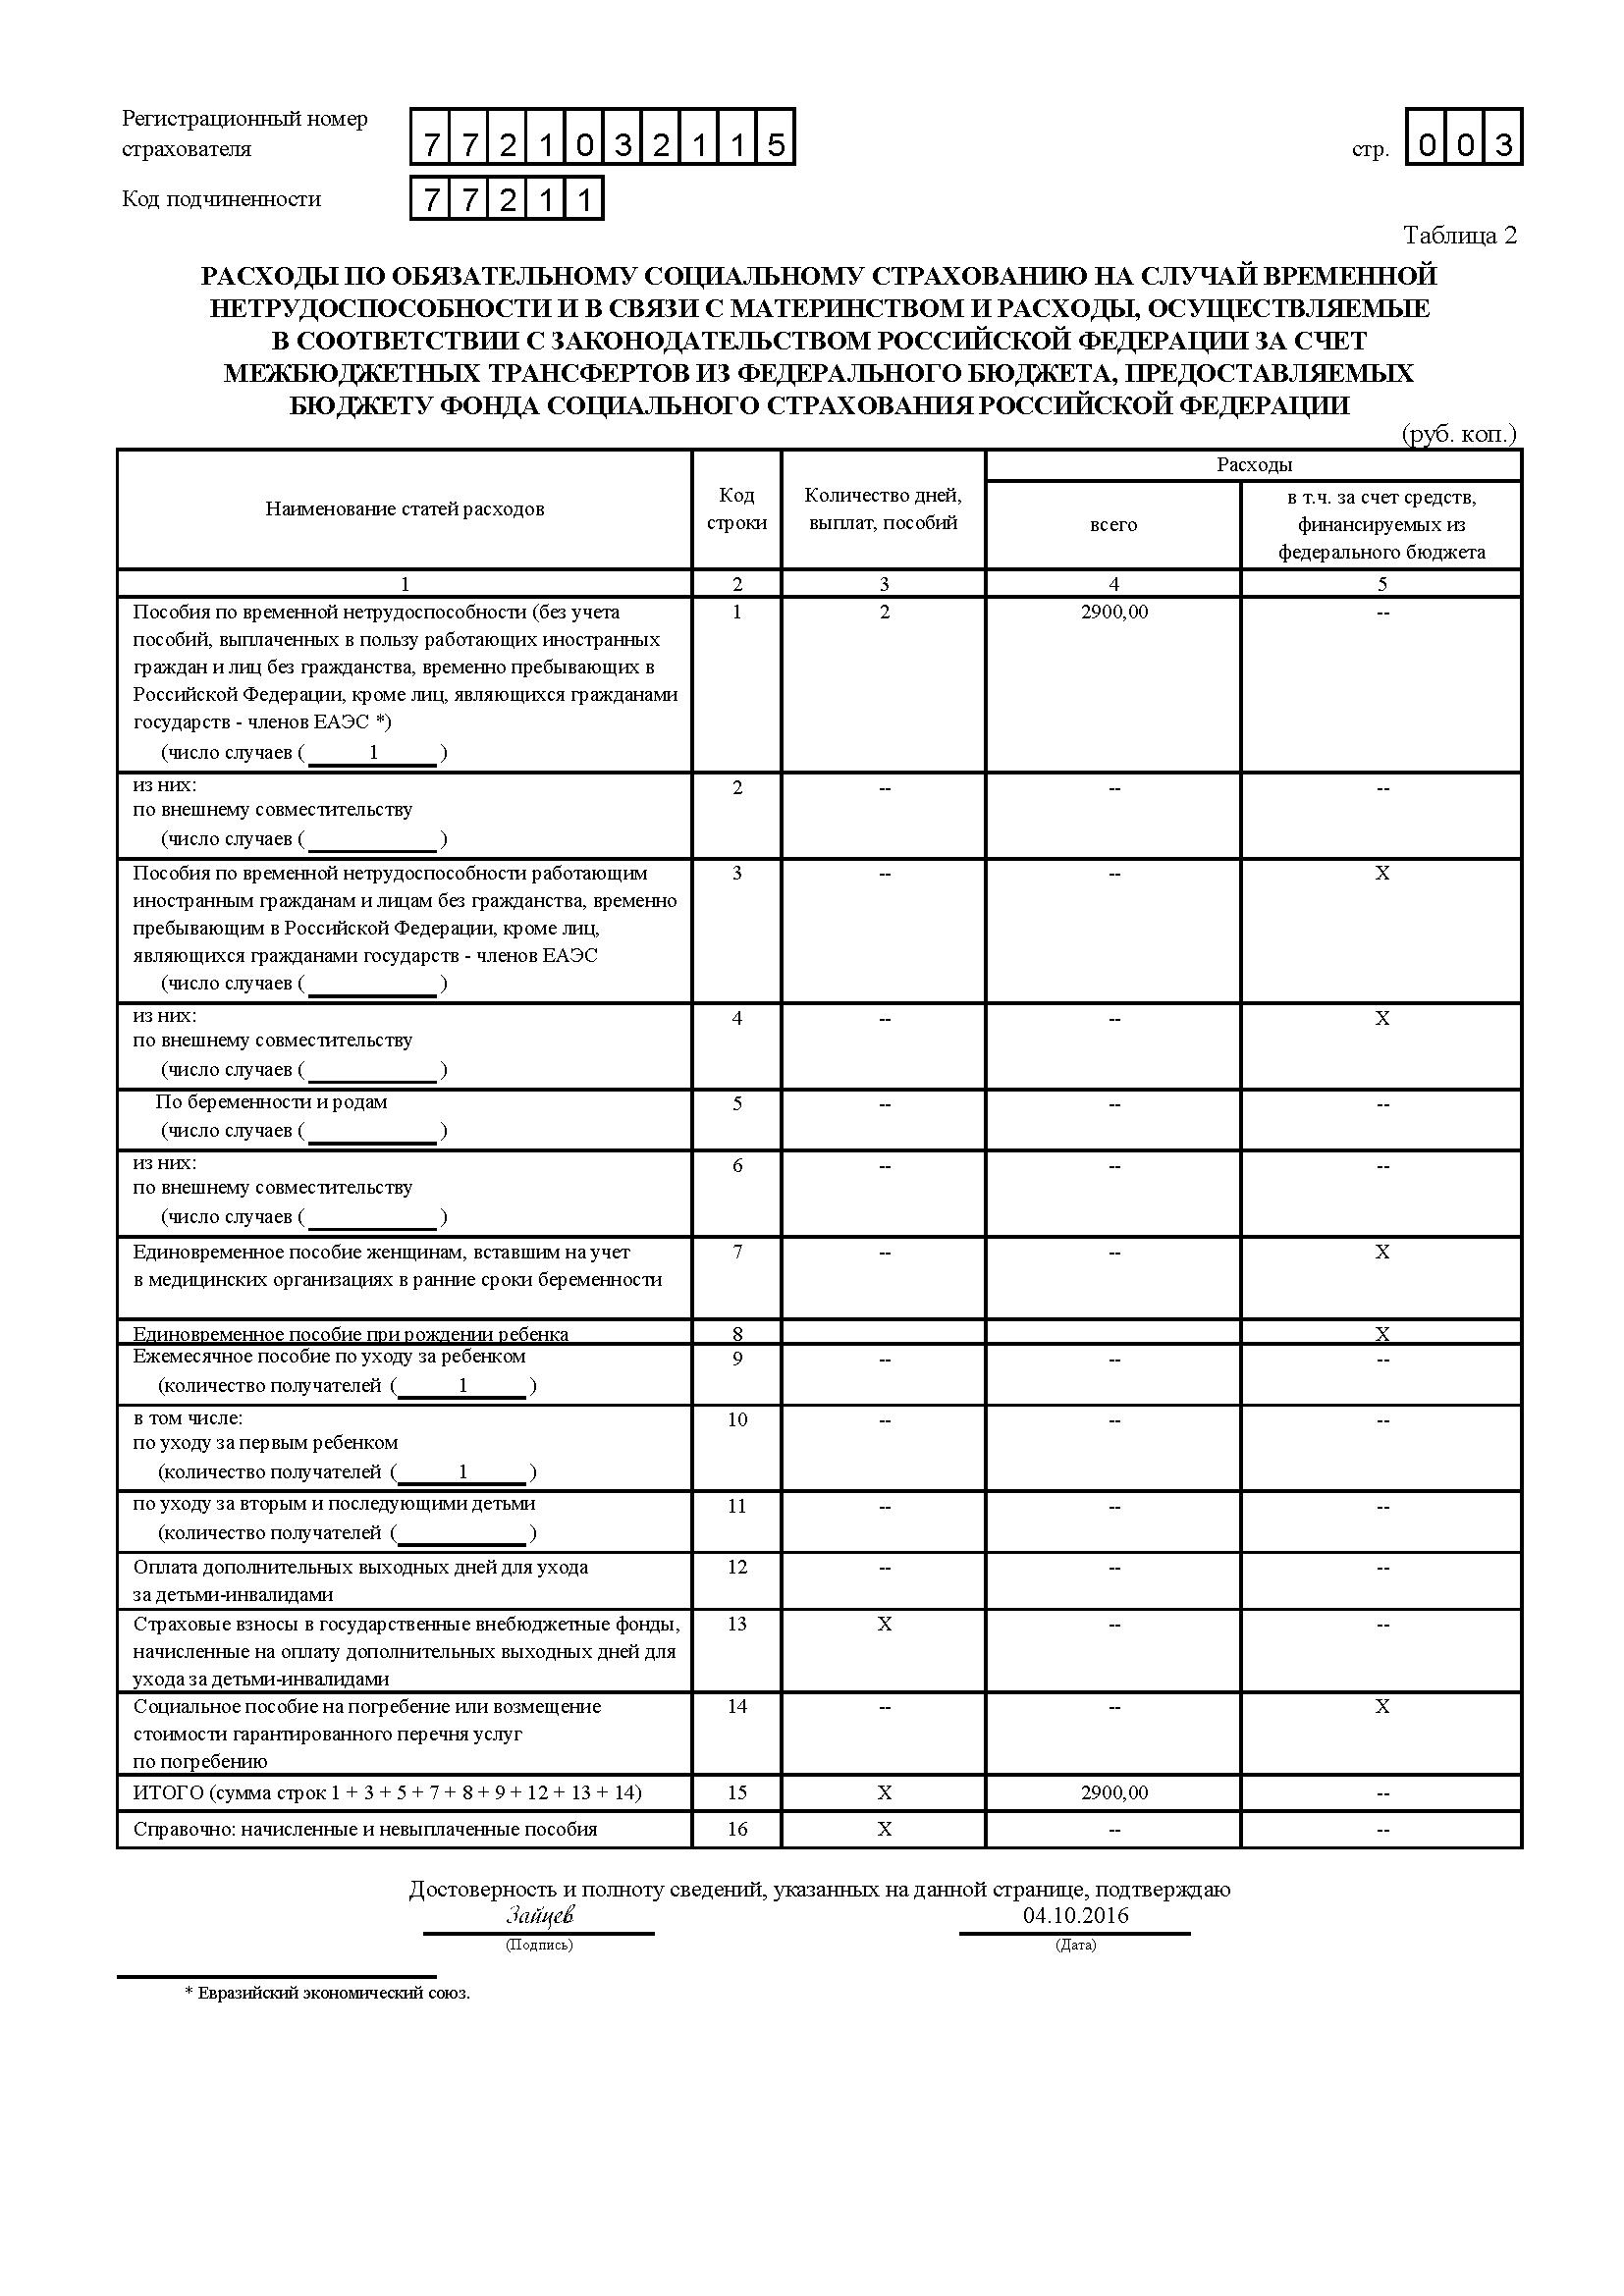 h бланки форма 4 фсс рф 2016